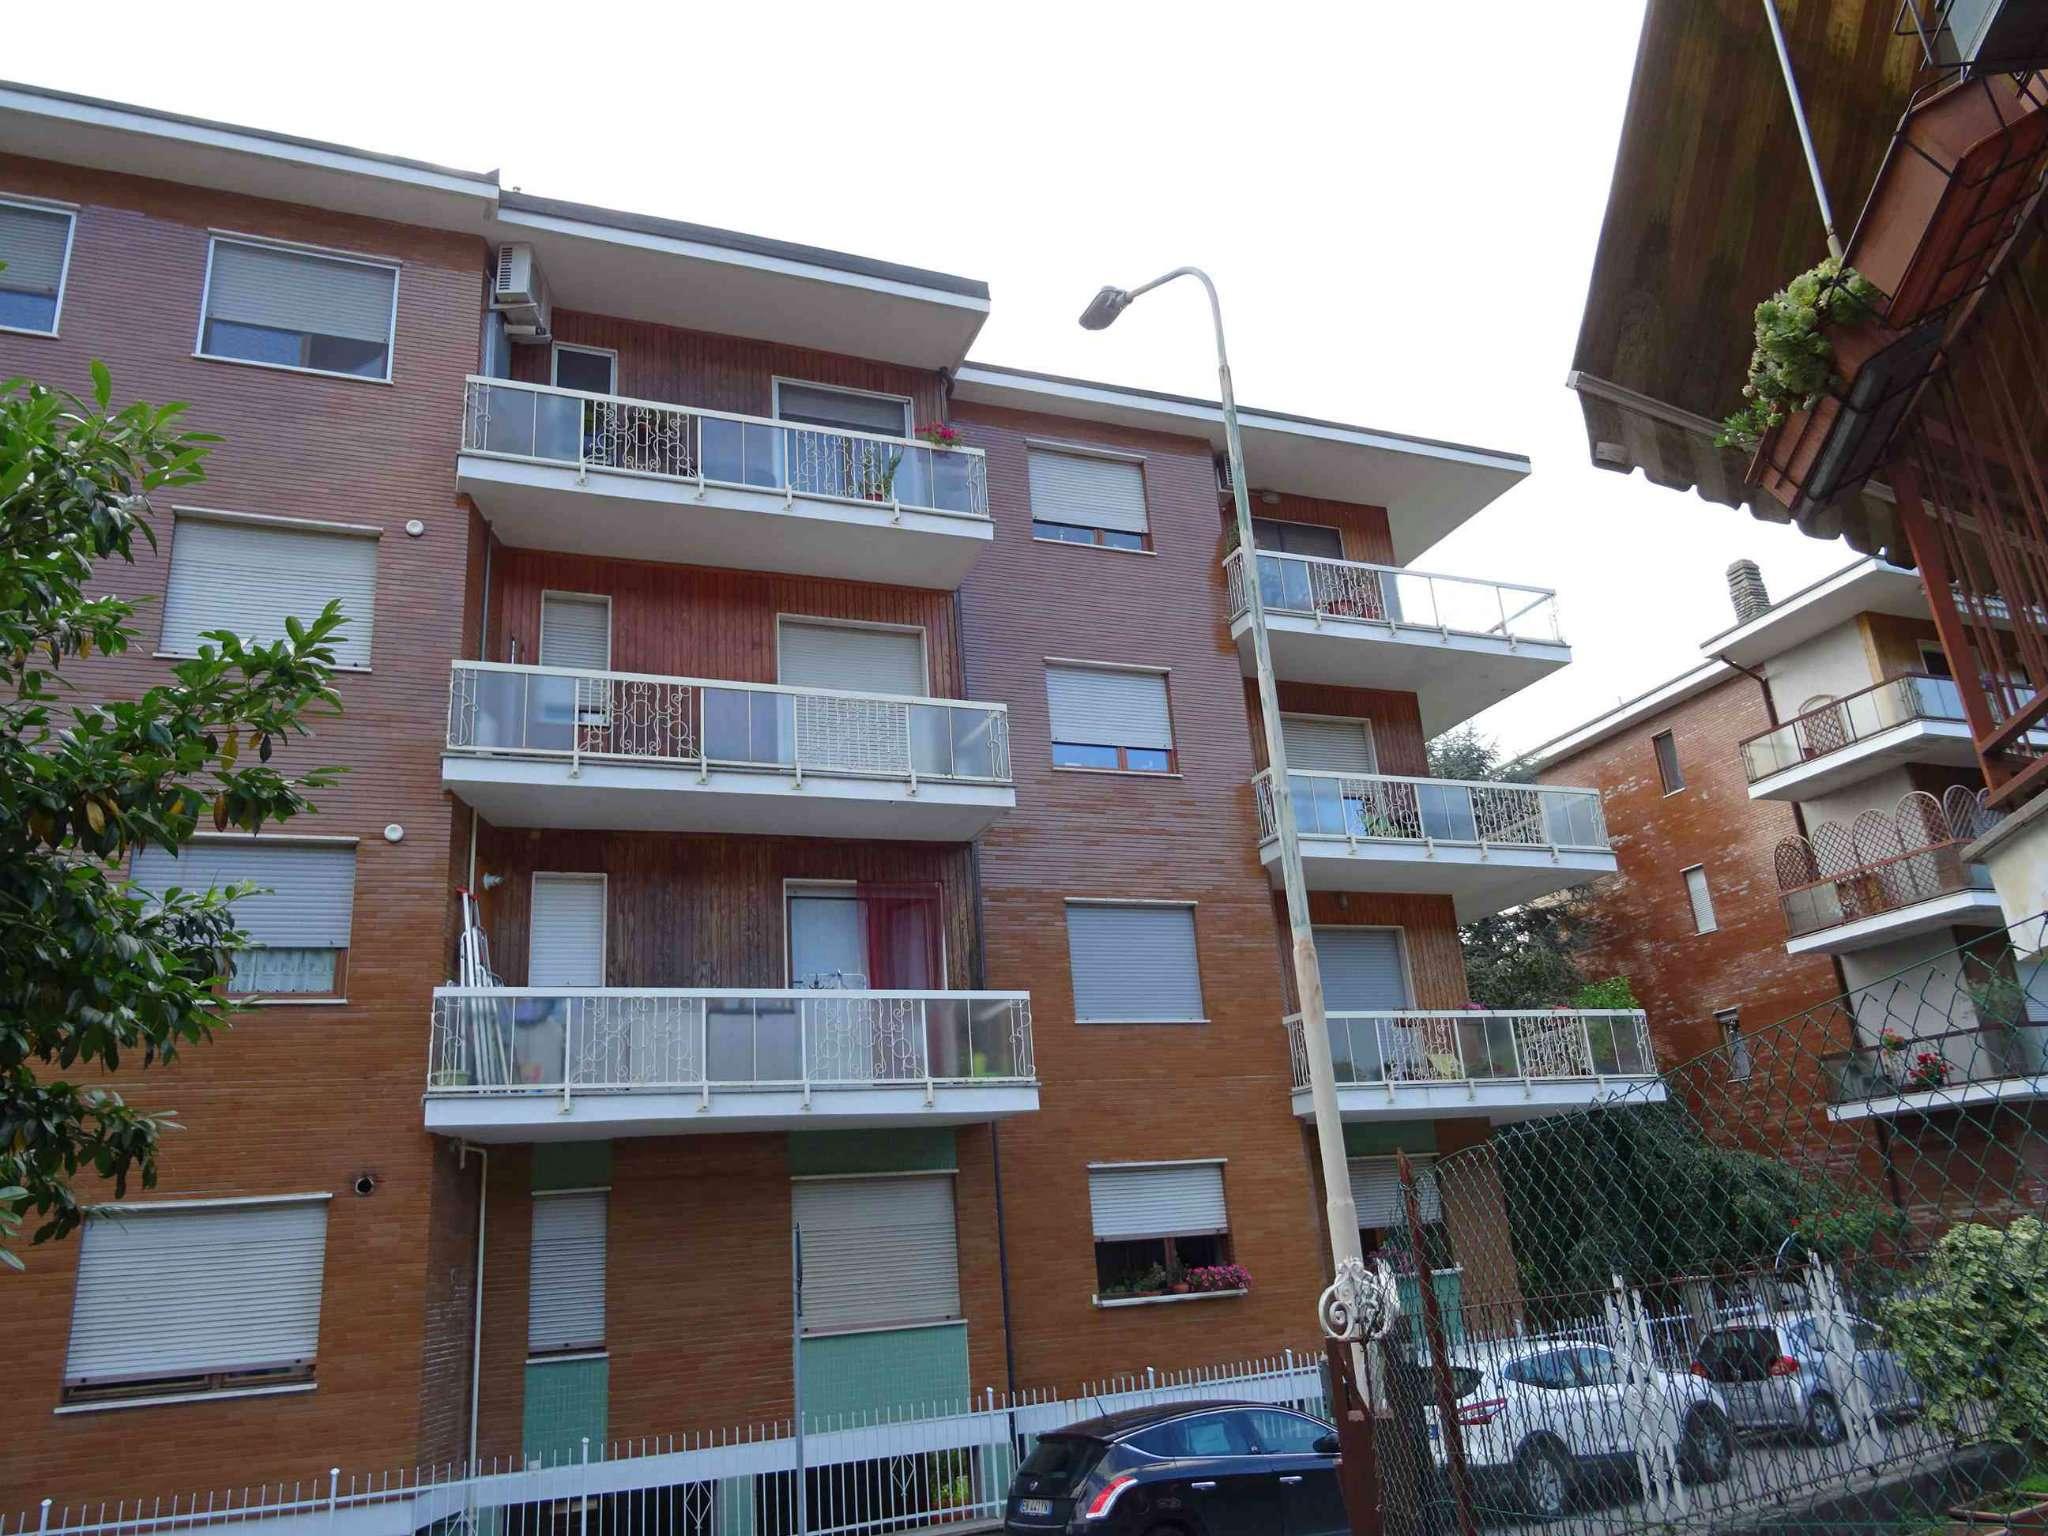 Appartamento in vendita strada Rebaude Moncalieri